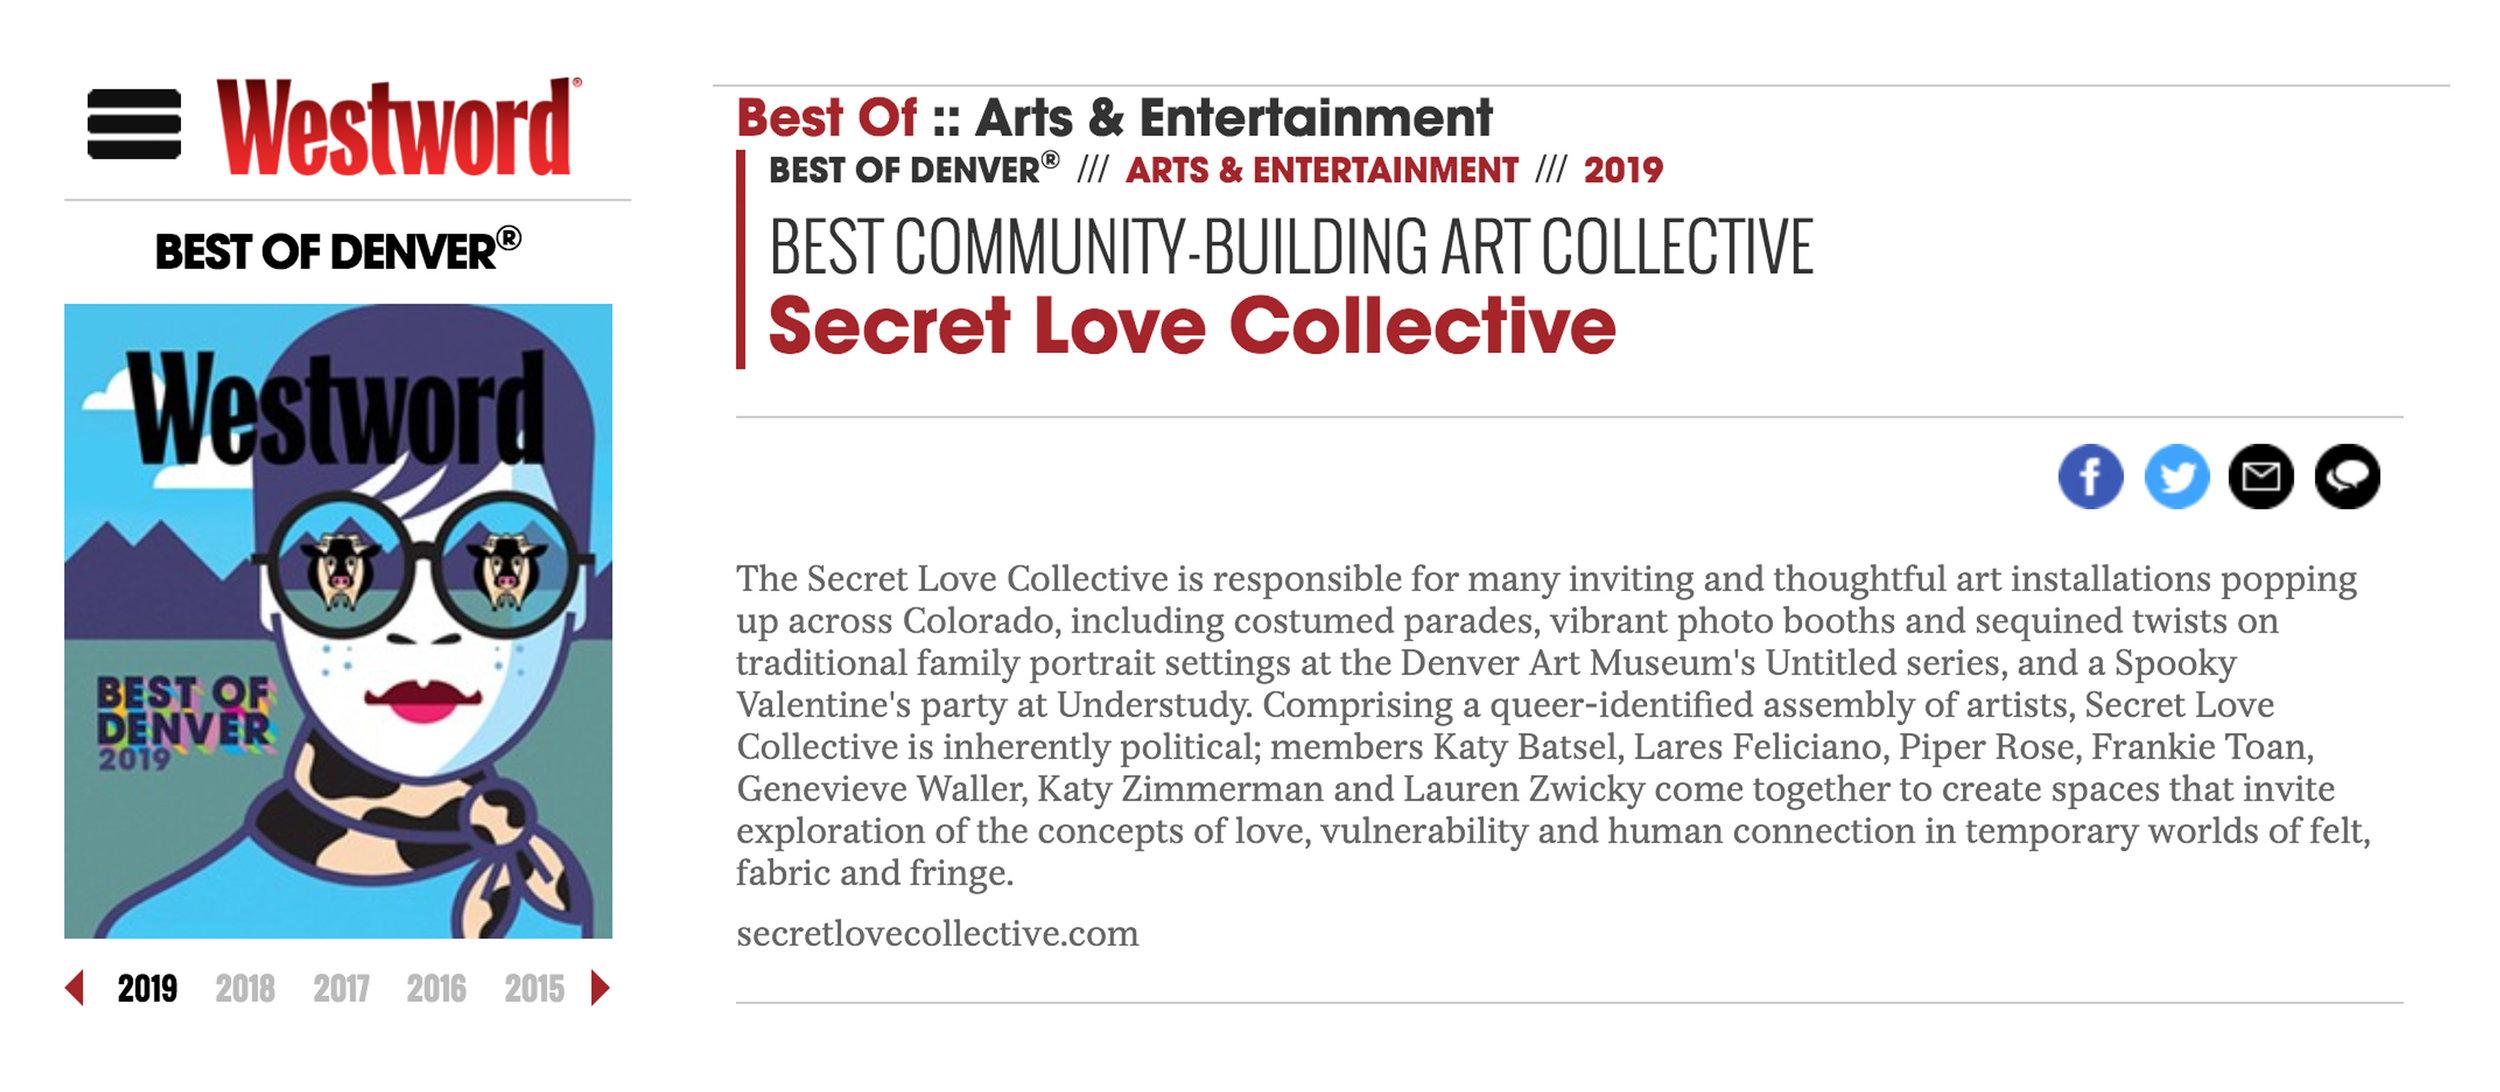 Best of Denver 2019 Best Community-Building Art Collective Secret Love Collective - https://www.westword.com/best-of/2019/arts-and-entertainment/best-community-building-art-collective-11283201